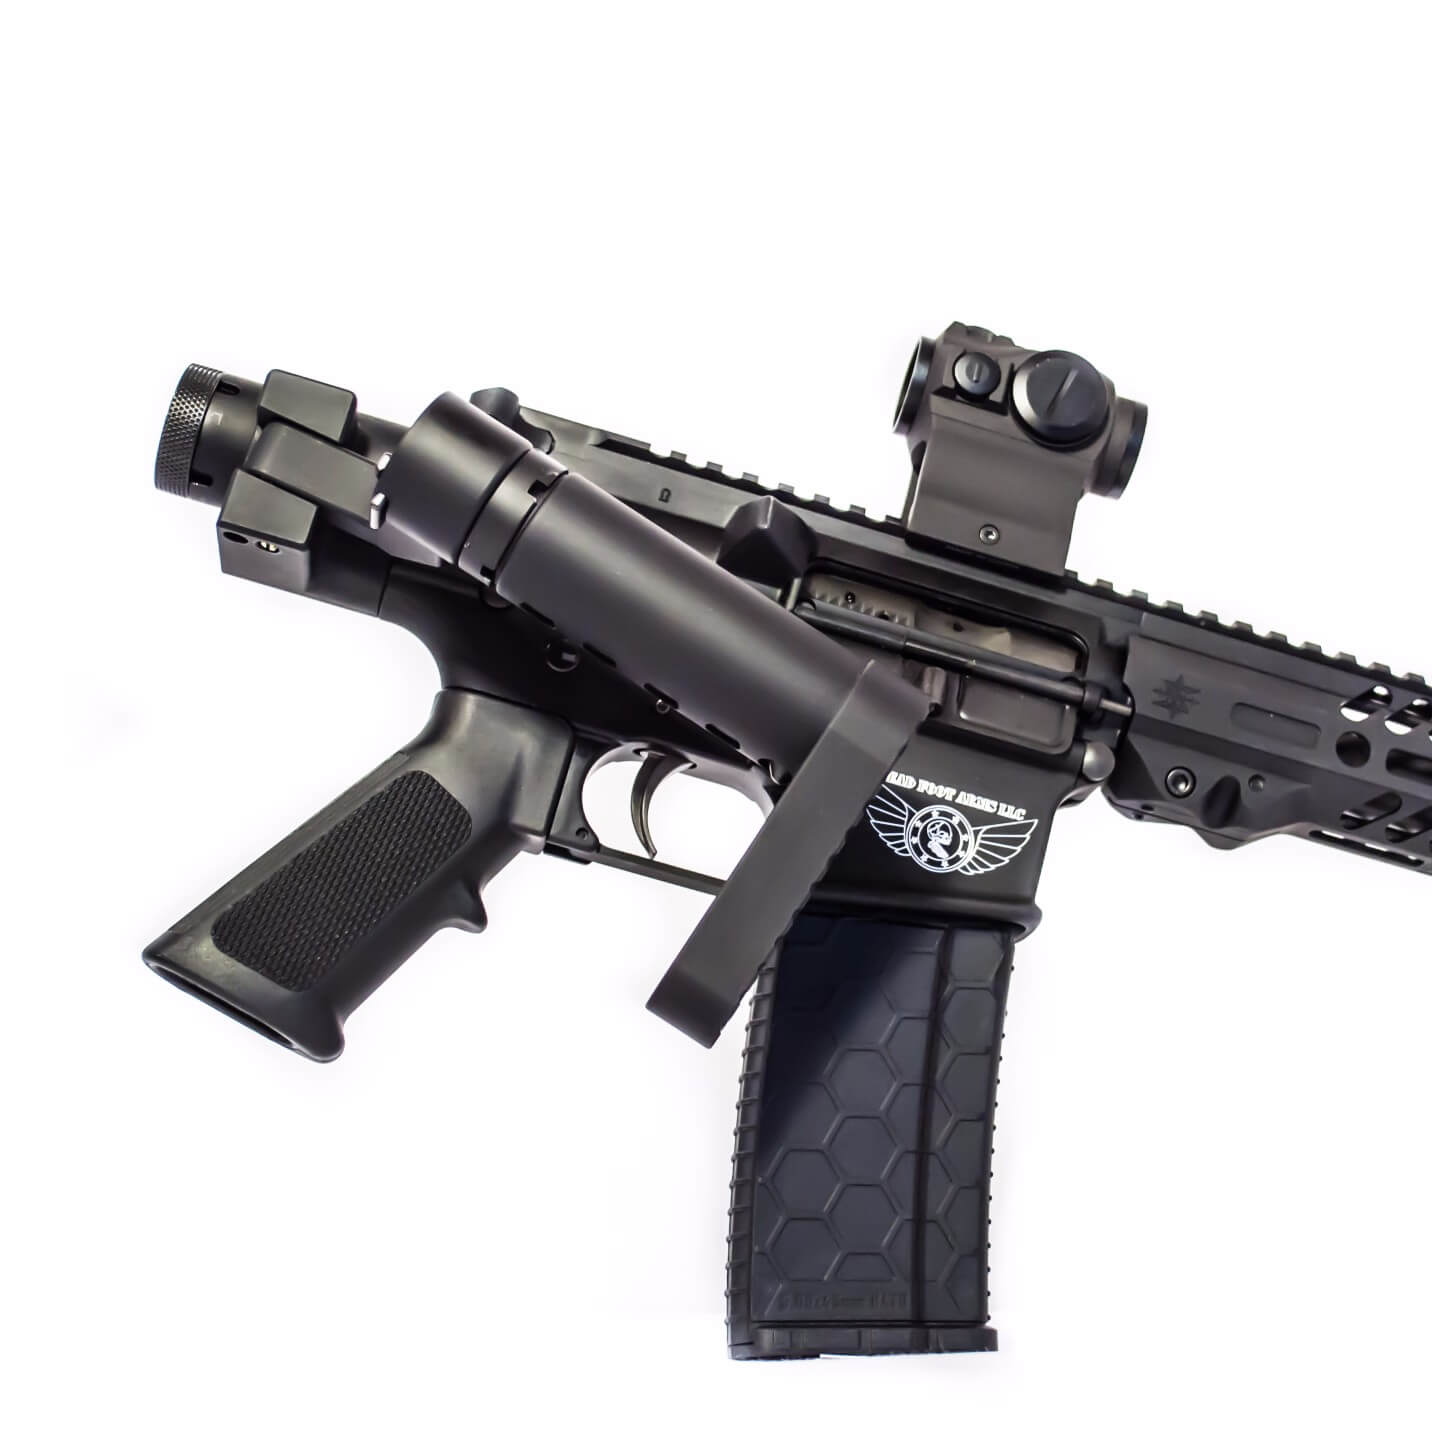 Dead Foot Arms Triggrcon Firearms Convention